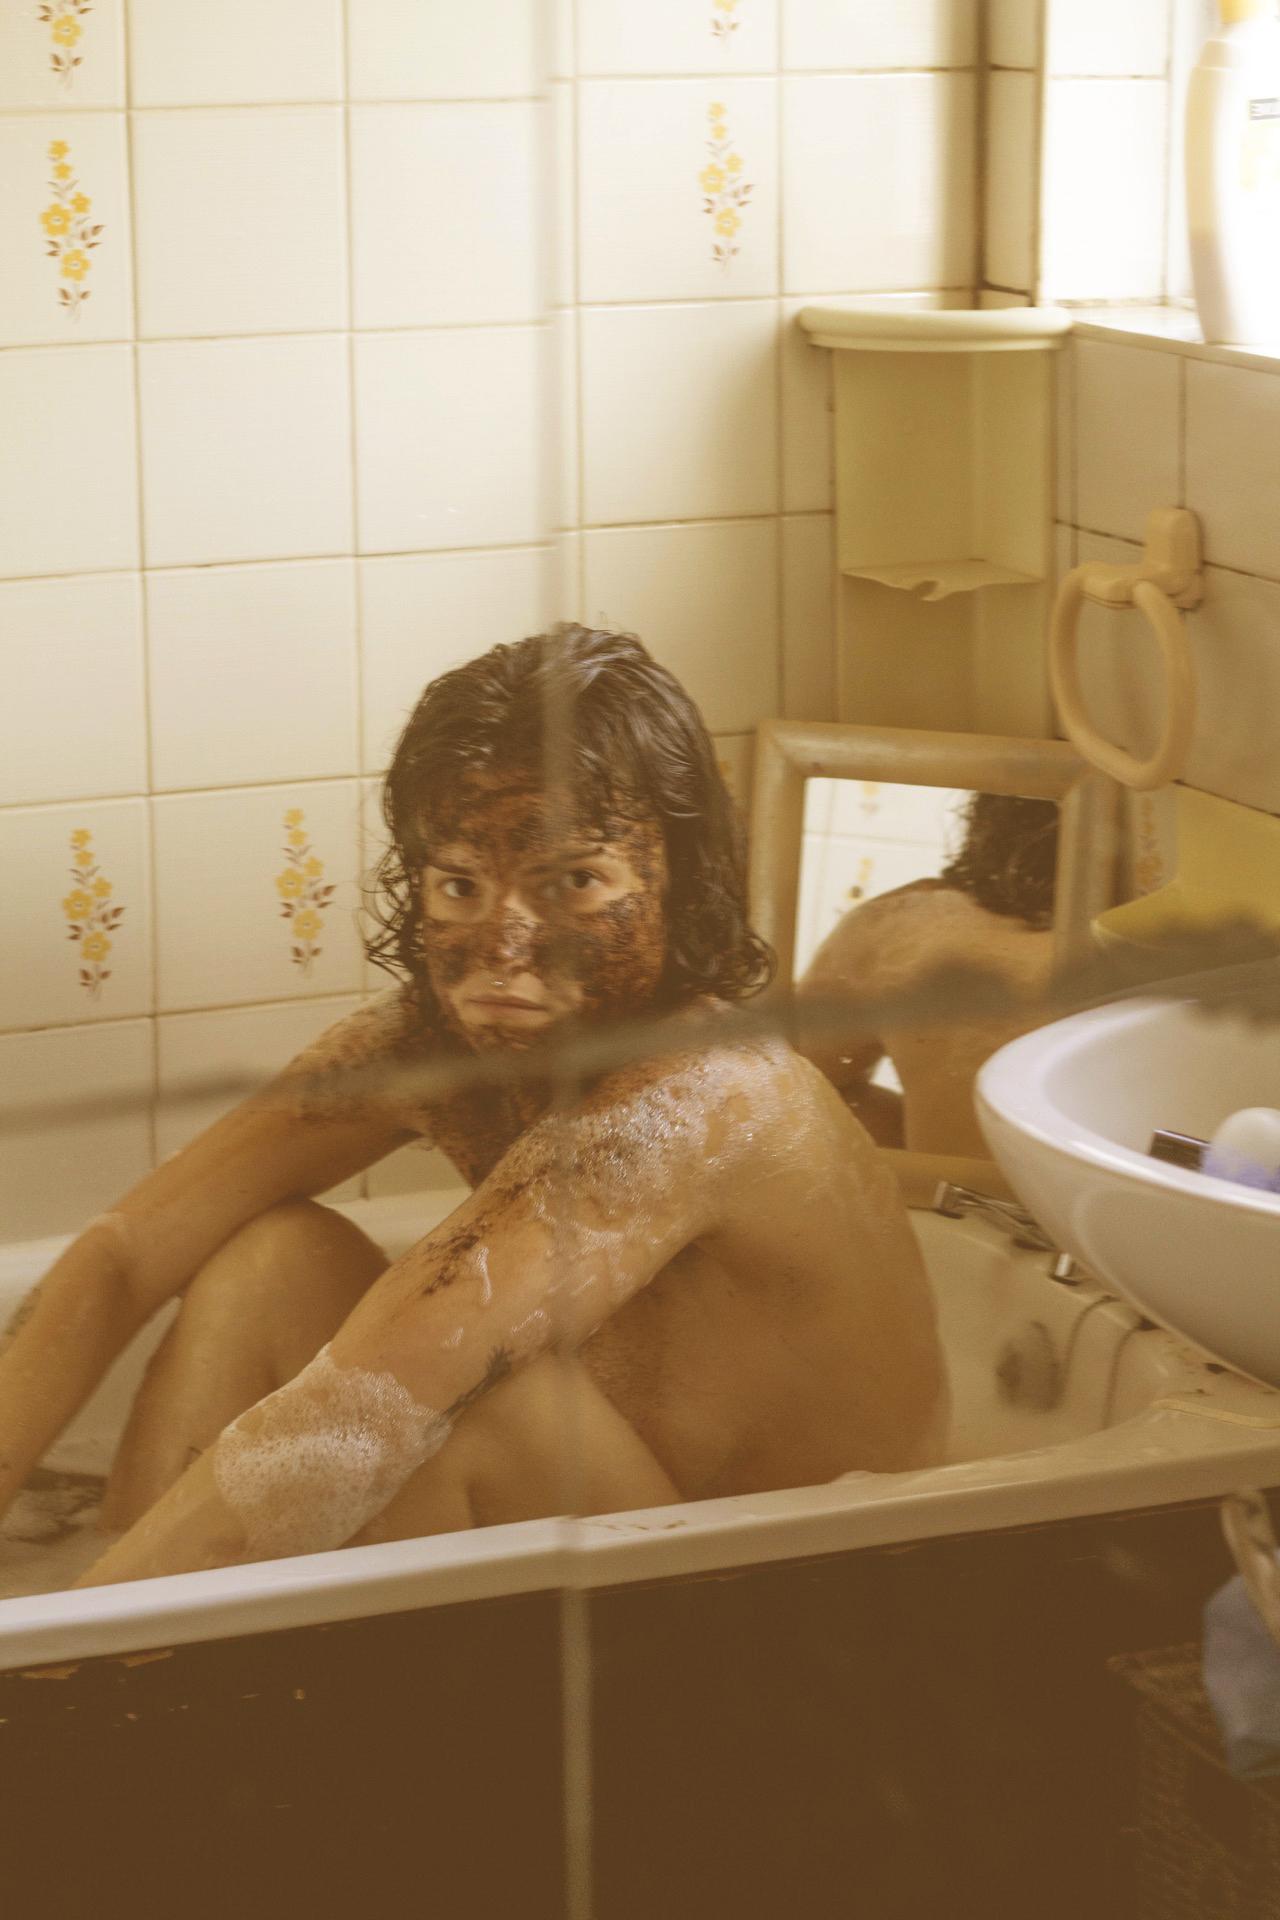 Coffee bathing. 2019